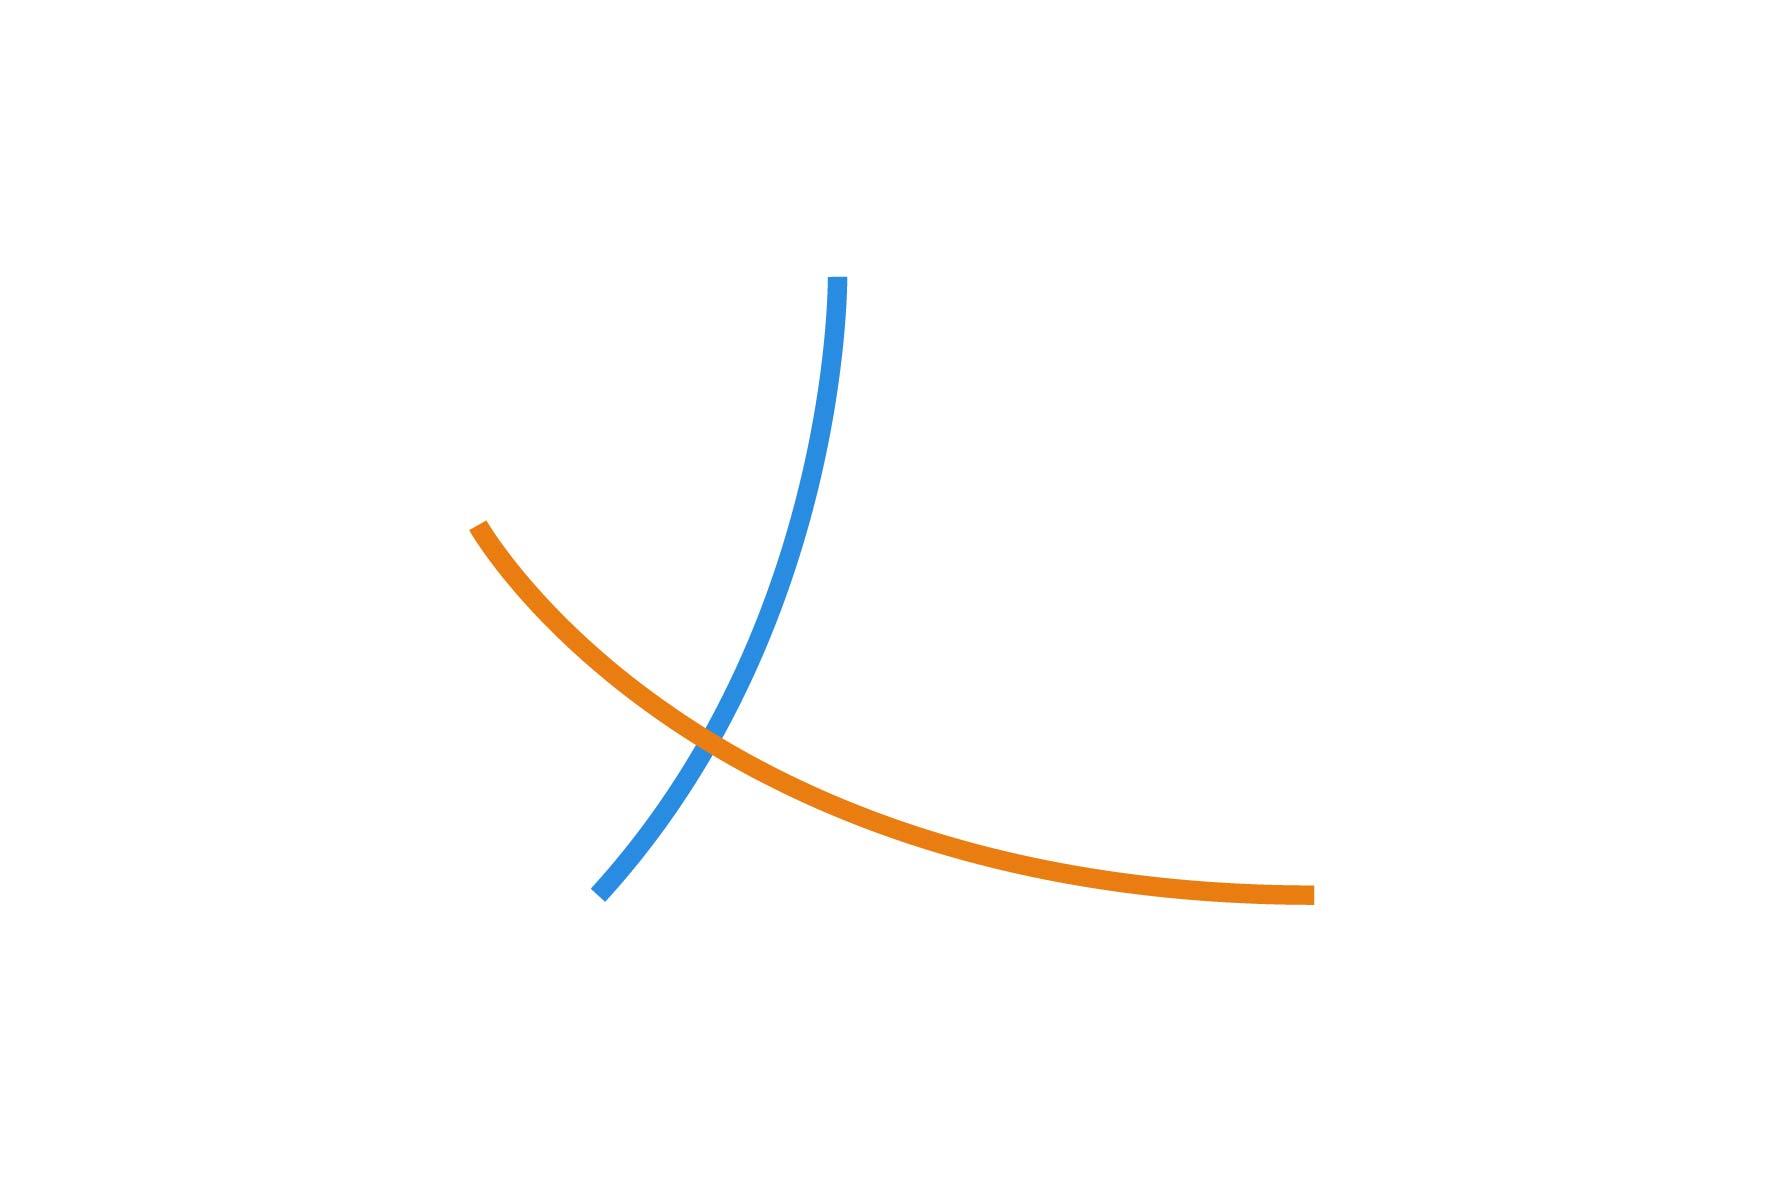 Lumidian-symbol-Daniel-Cavalcanti